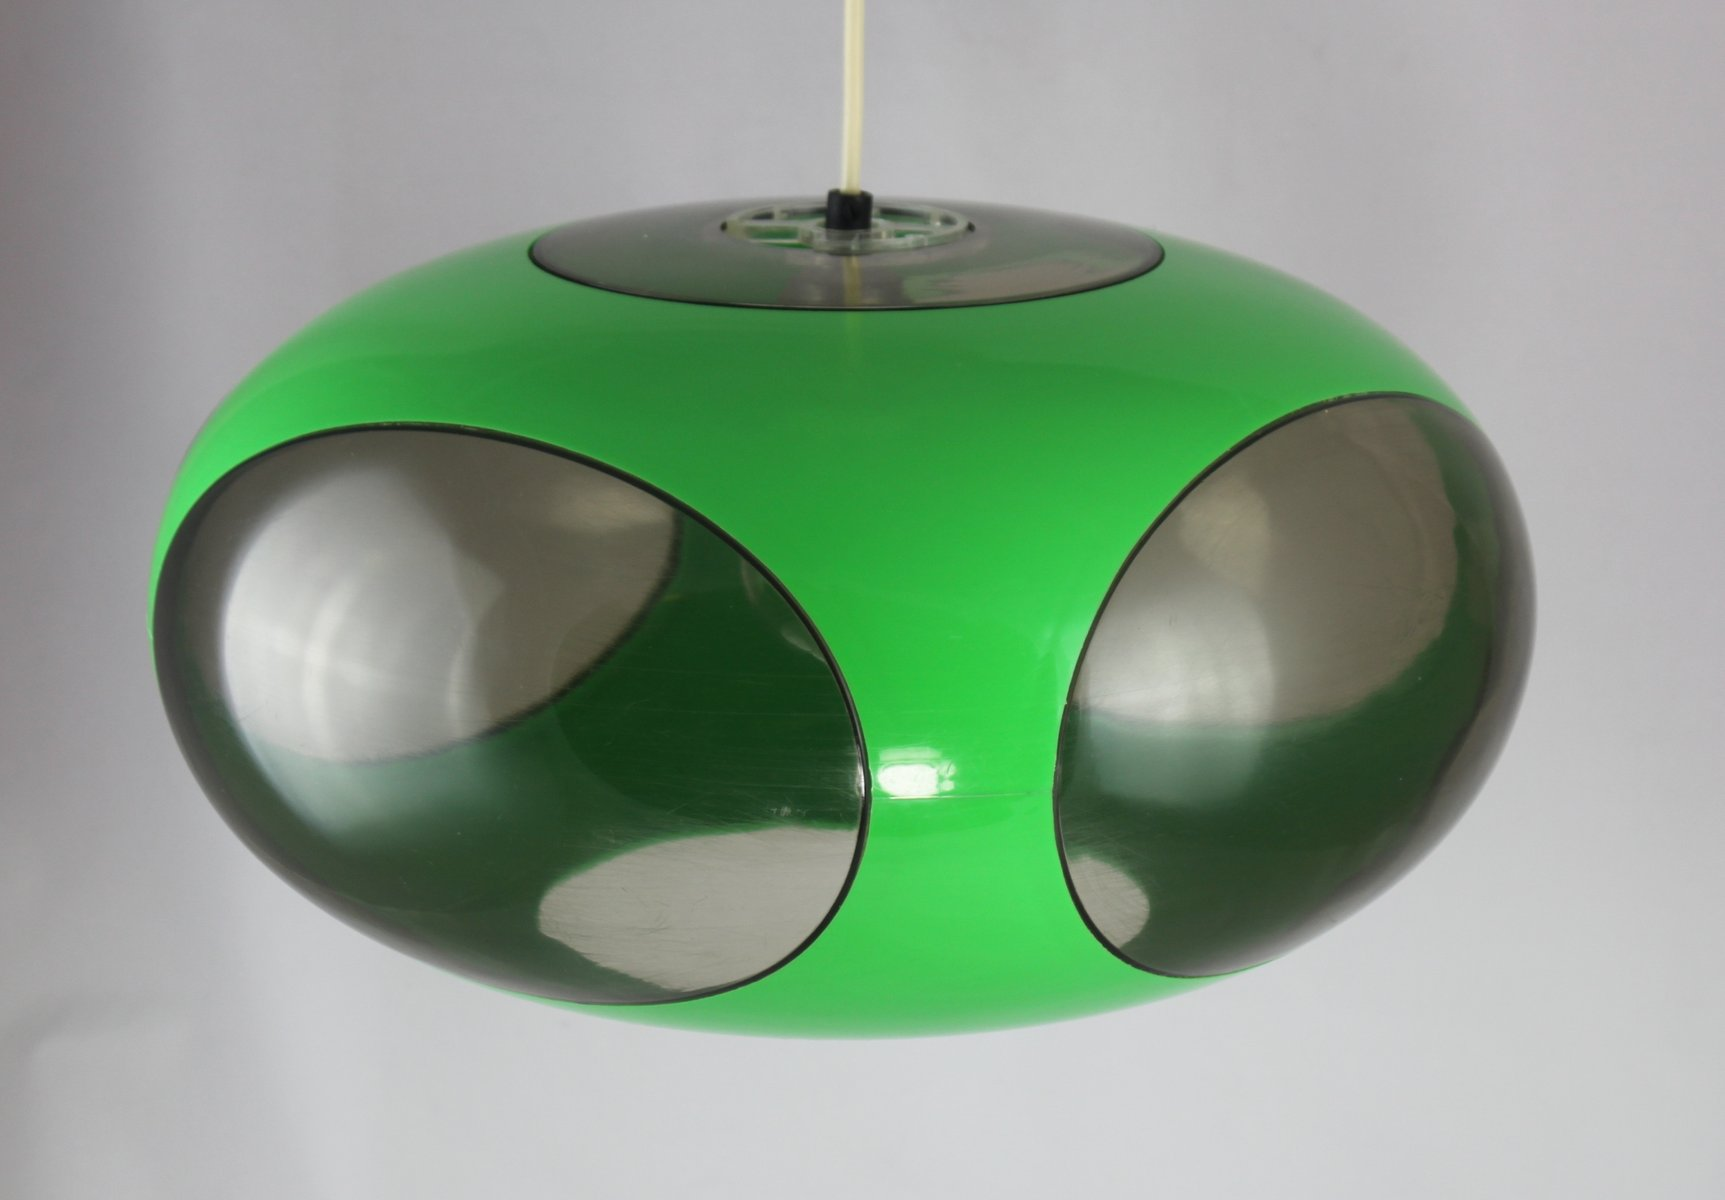 Grüne UFO Lampe von Luigi Colani, 1970er